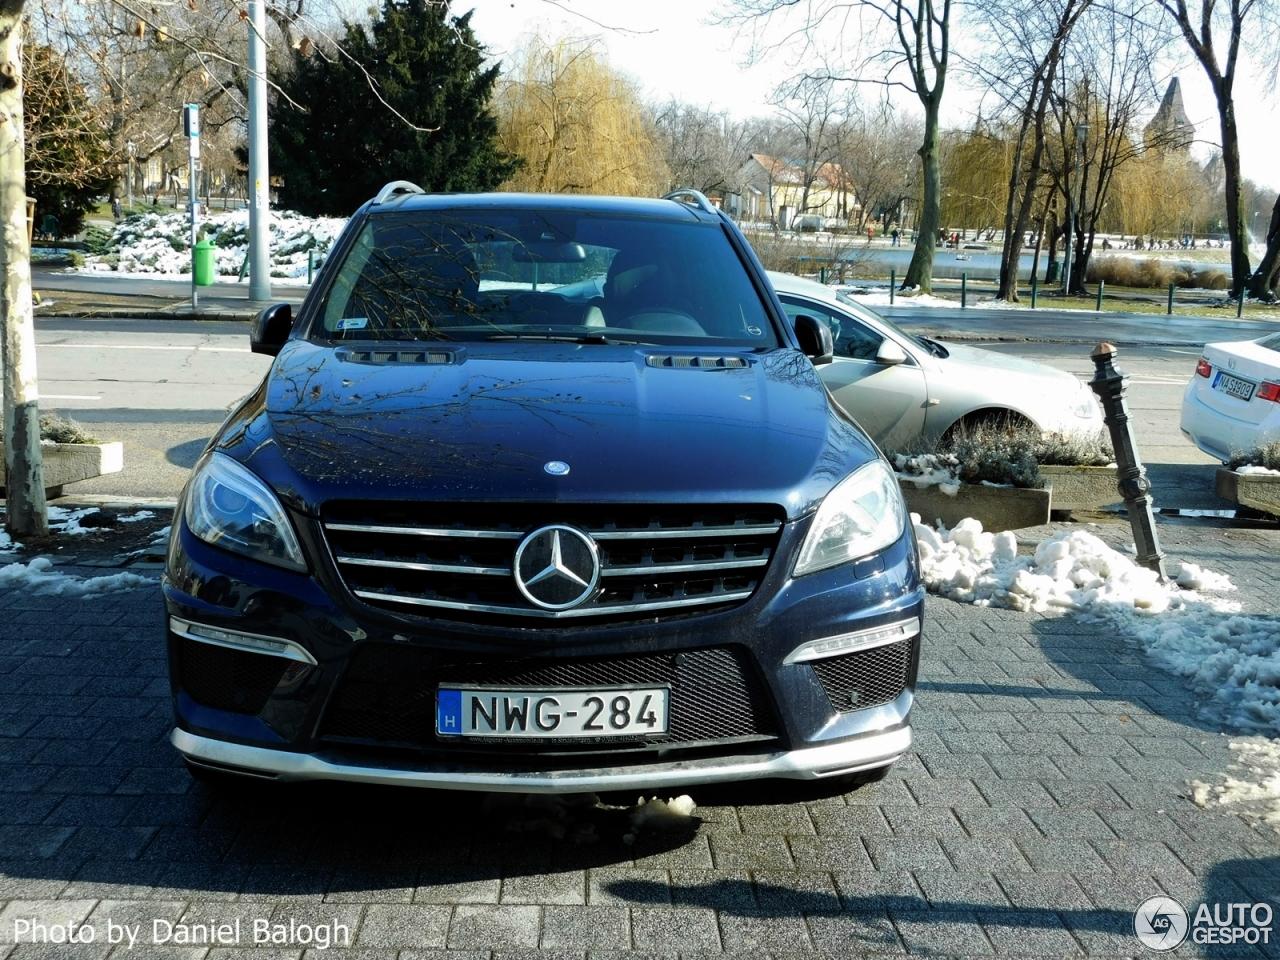 Mercedes Benz Ml 63 Amg W166 22 February 2018 Autogespot